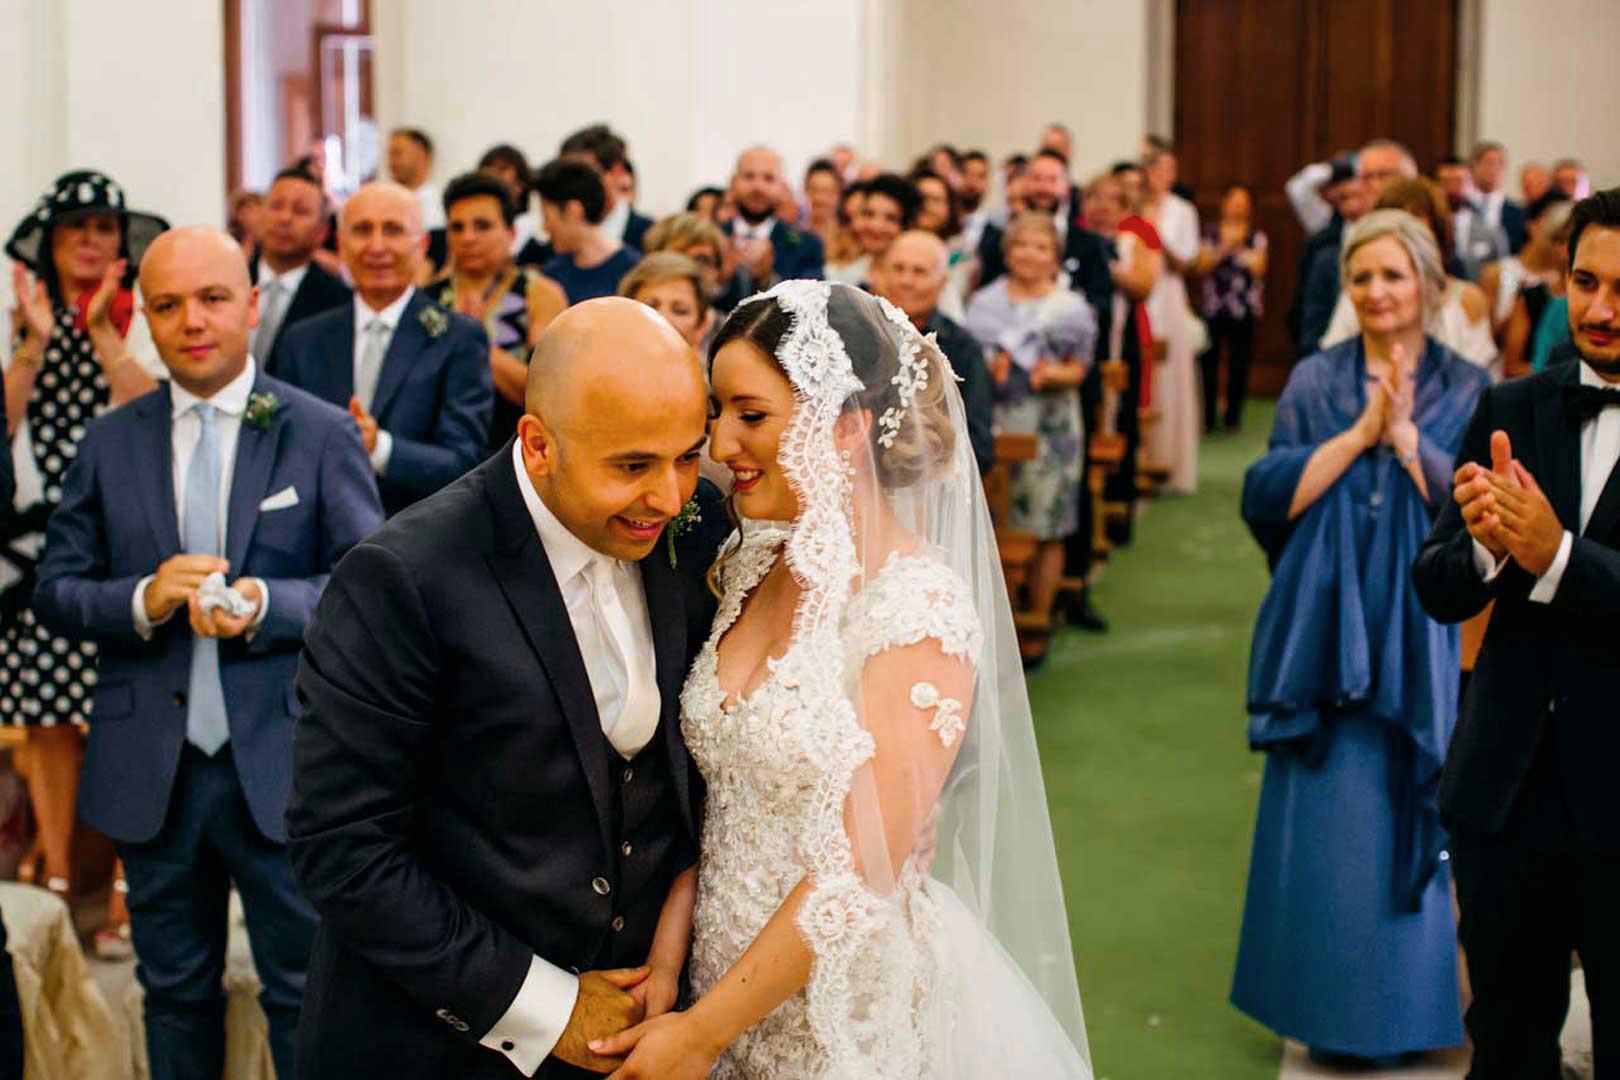 019-cerimonia-matrimonio-gianni-lepore-fotografo-lucera